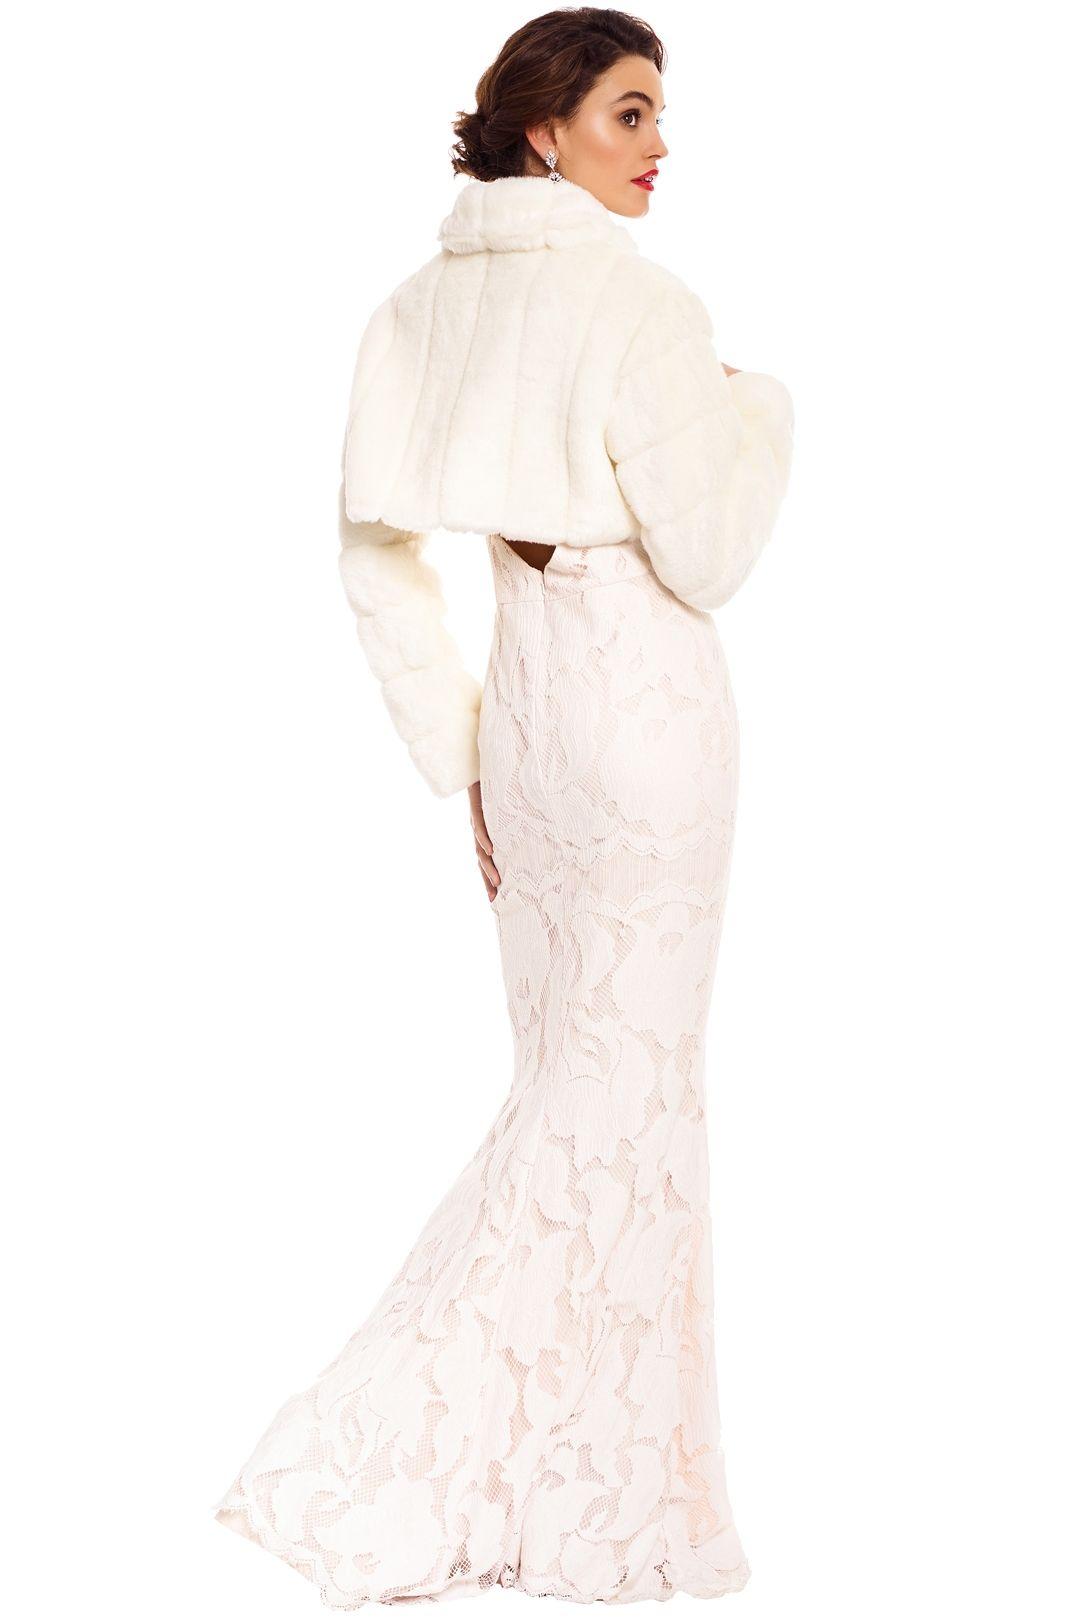 Tulip Bridal - Fayth Bolero - Ivory - Back